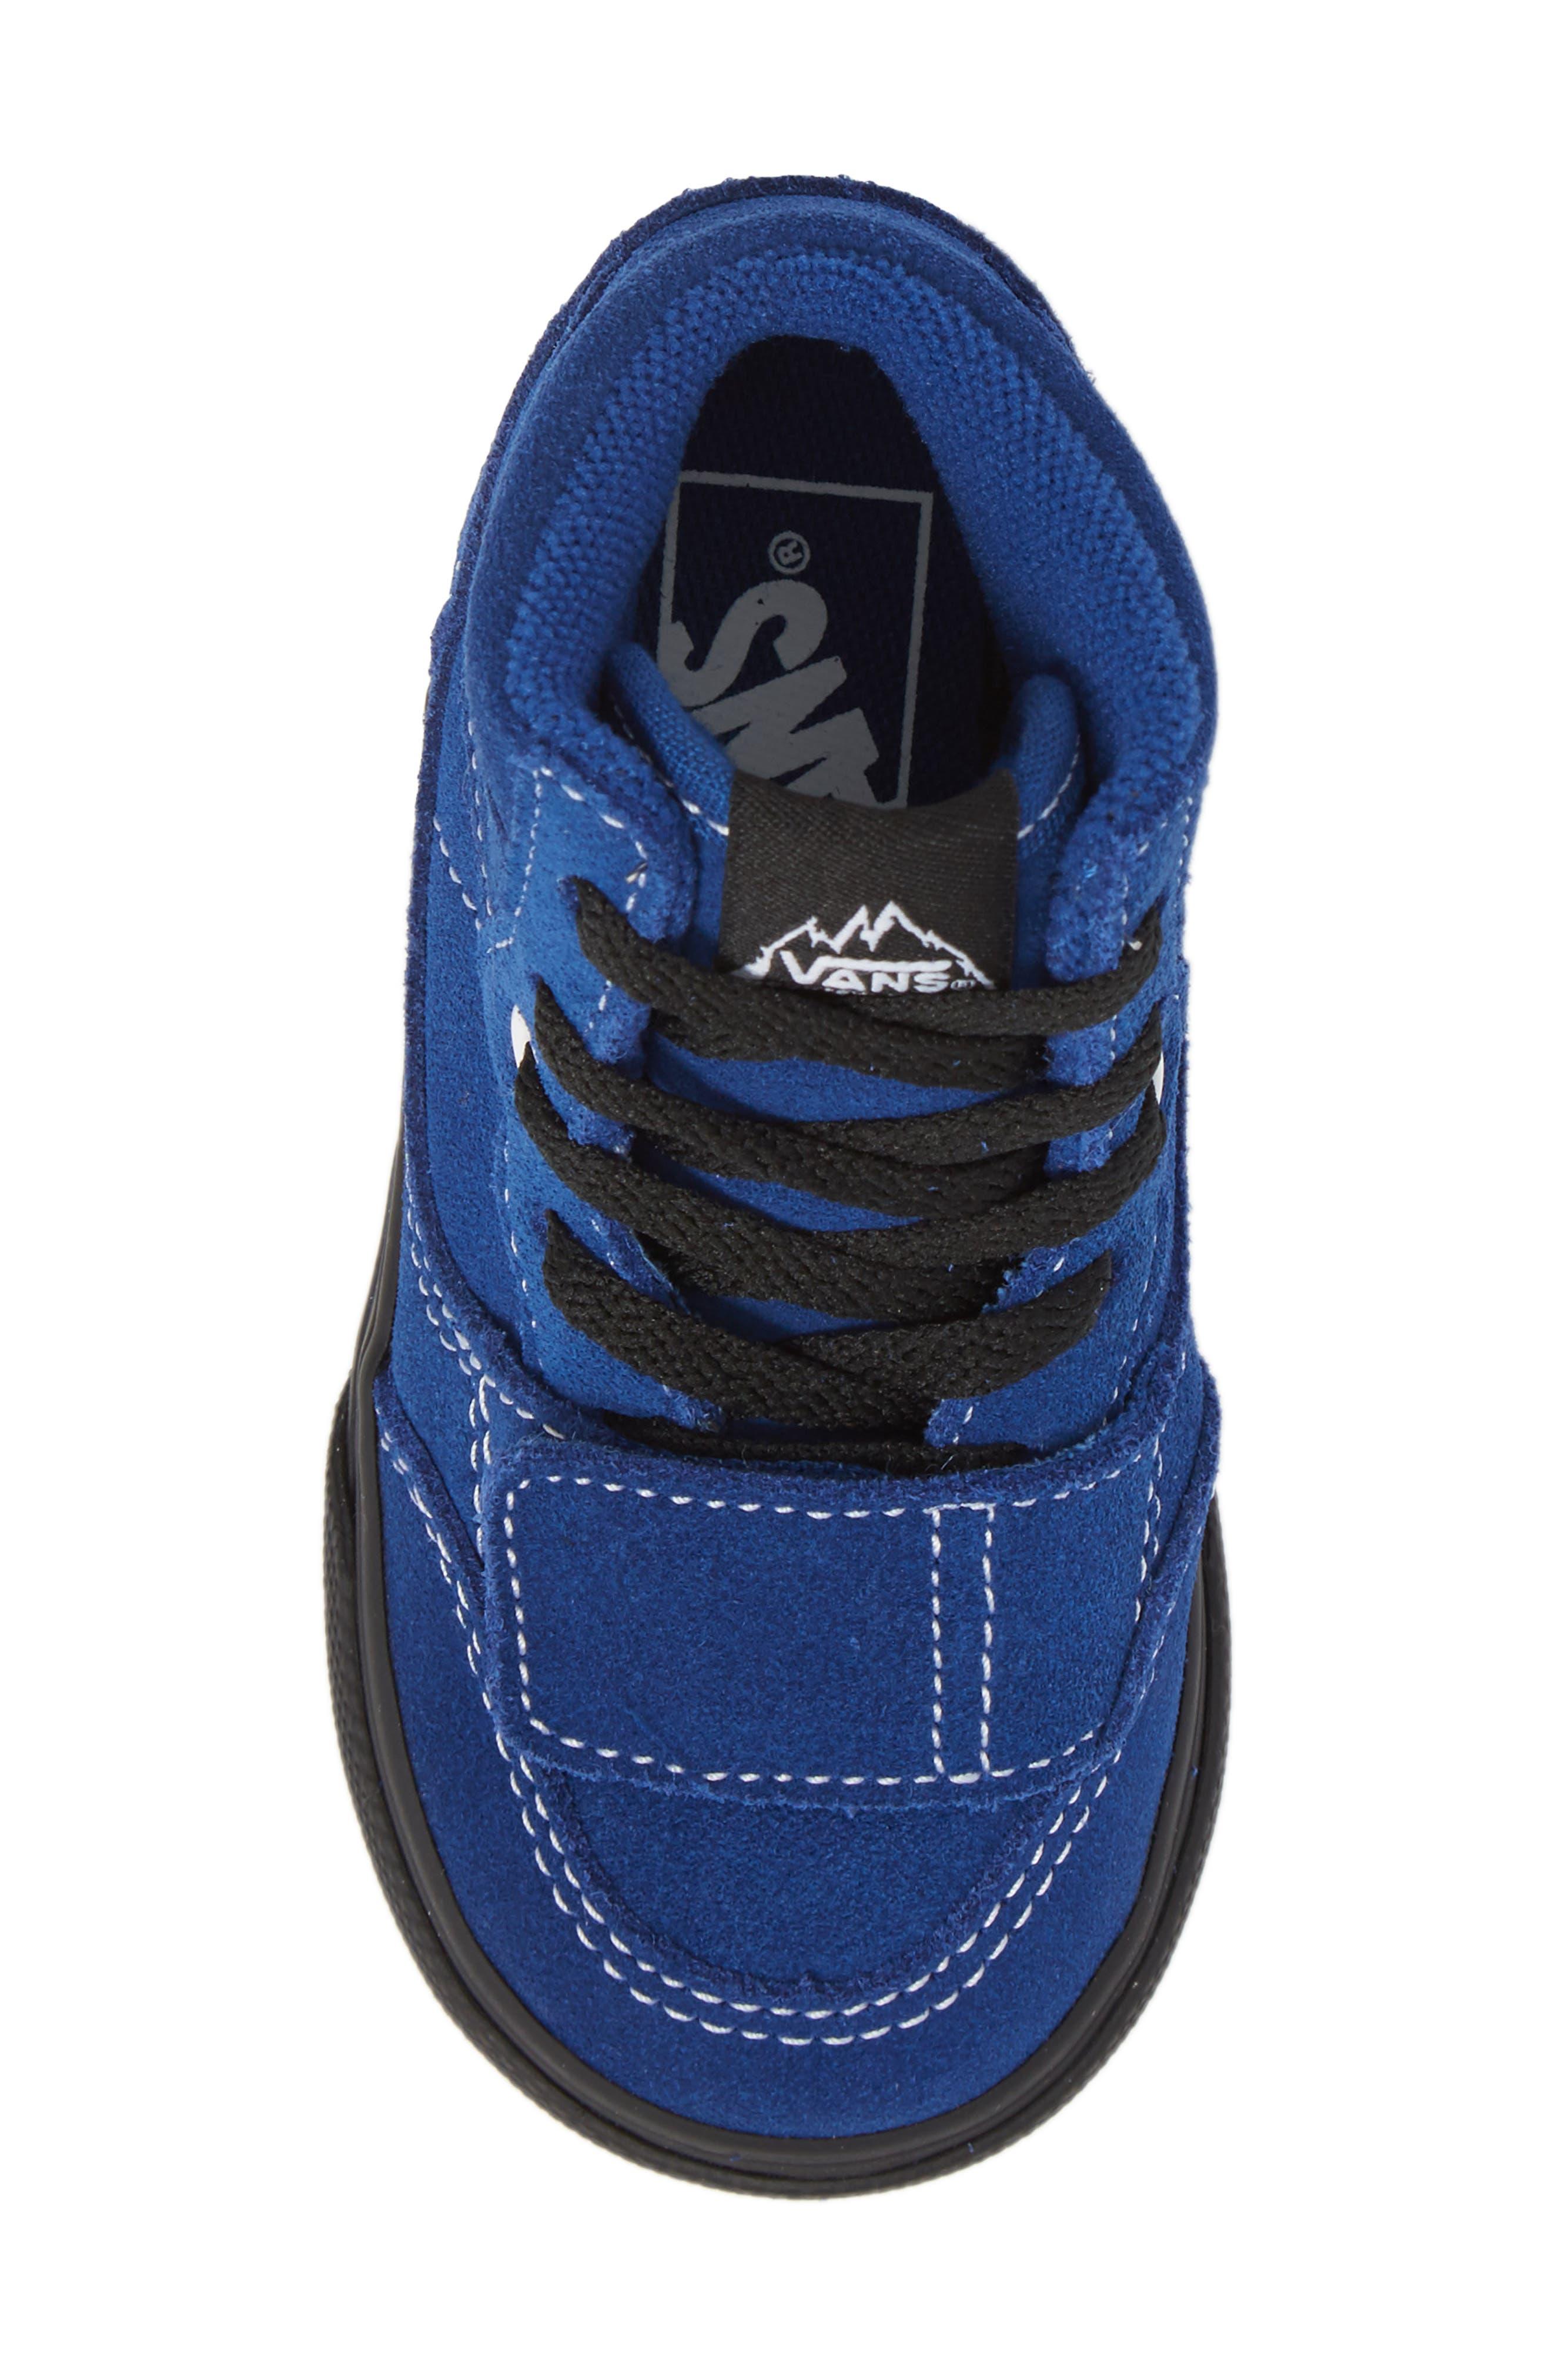 Mountain Edition Mid Top Sneaker,                             Alternate thumbnail 5, color,                             Blue/ Black